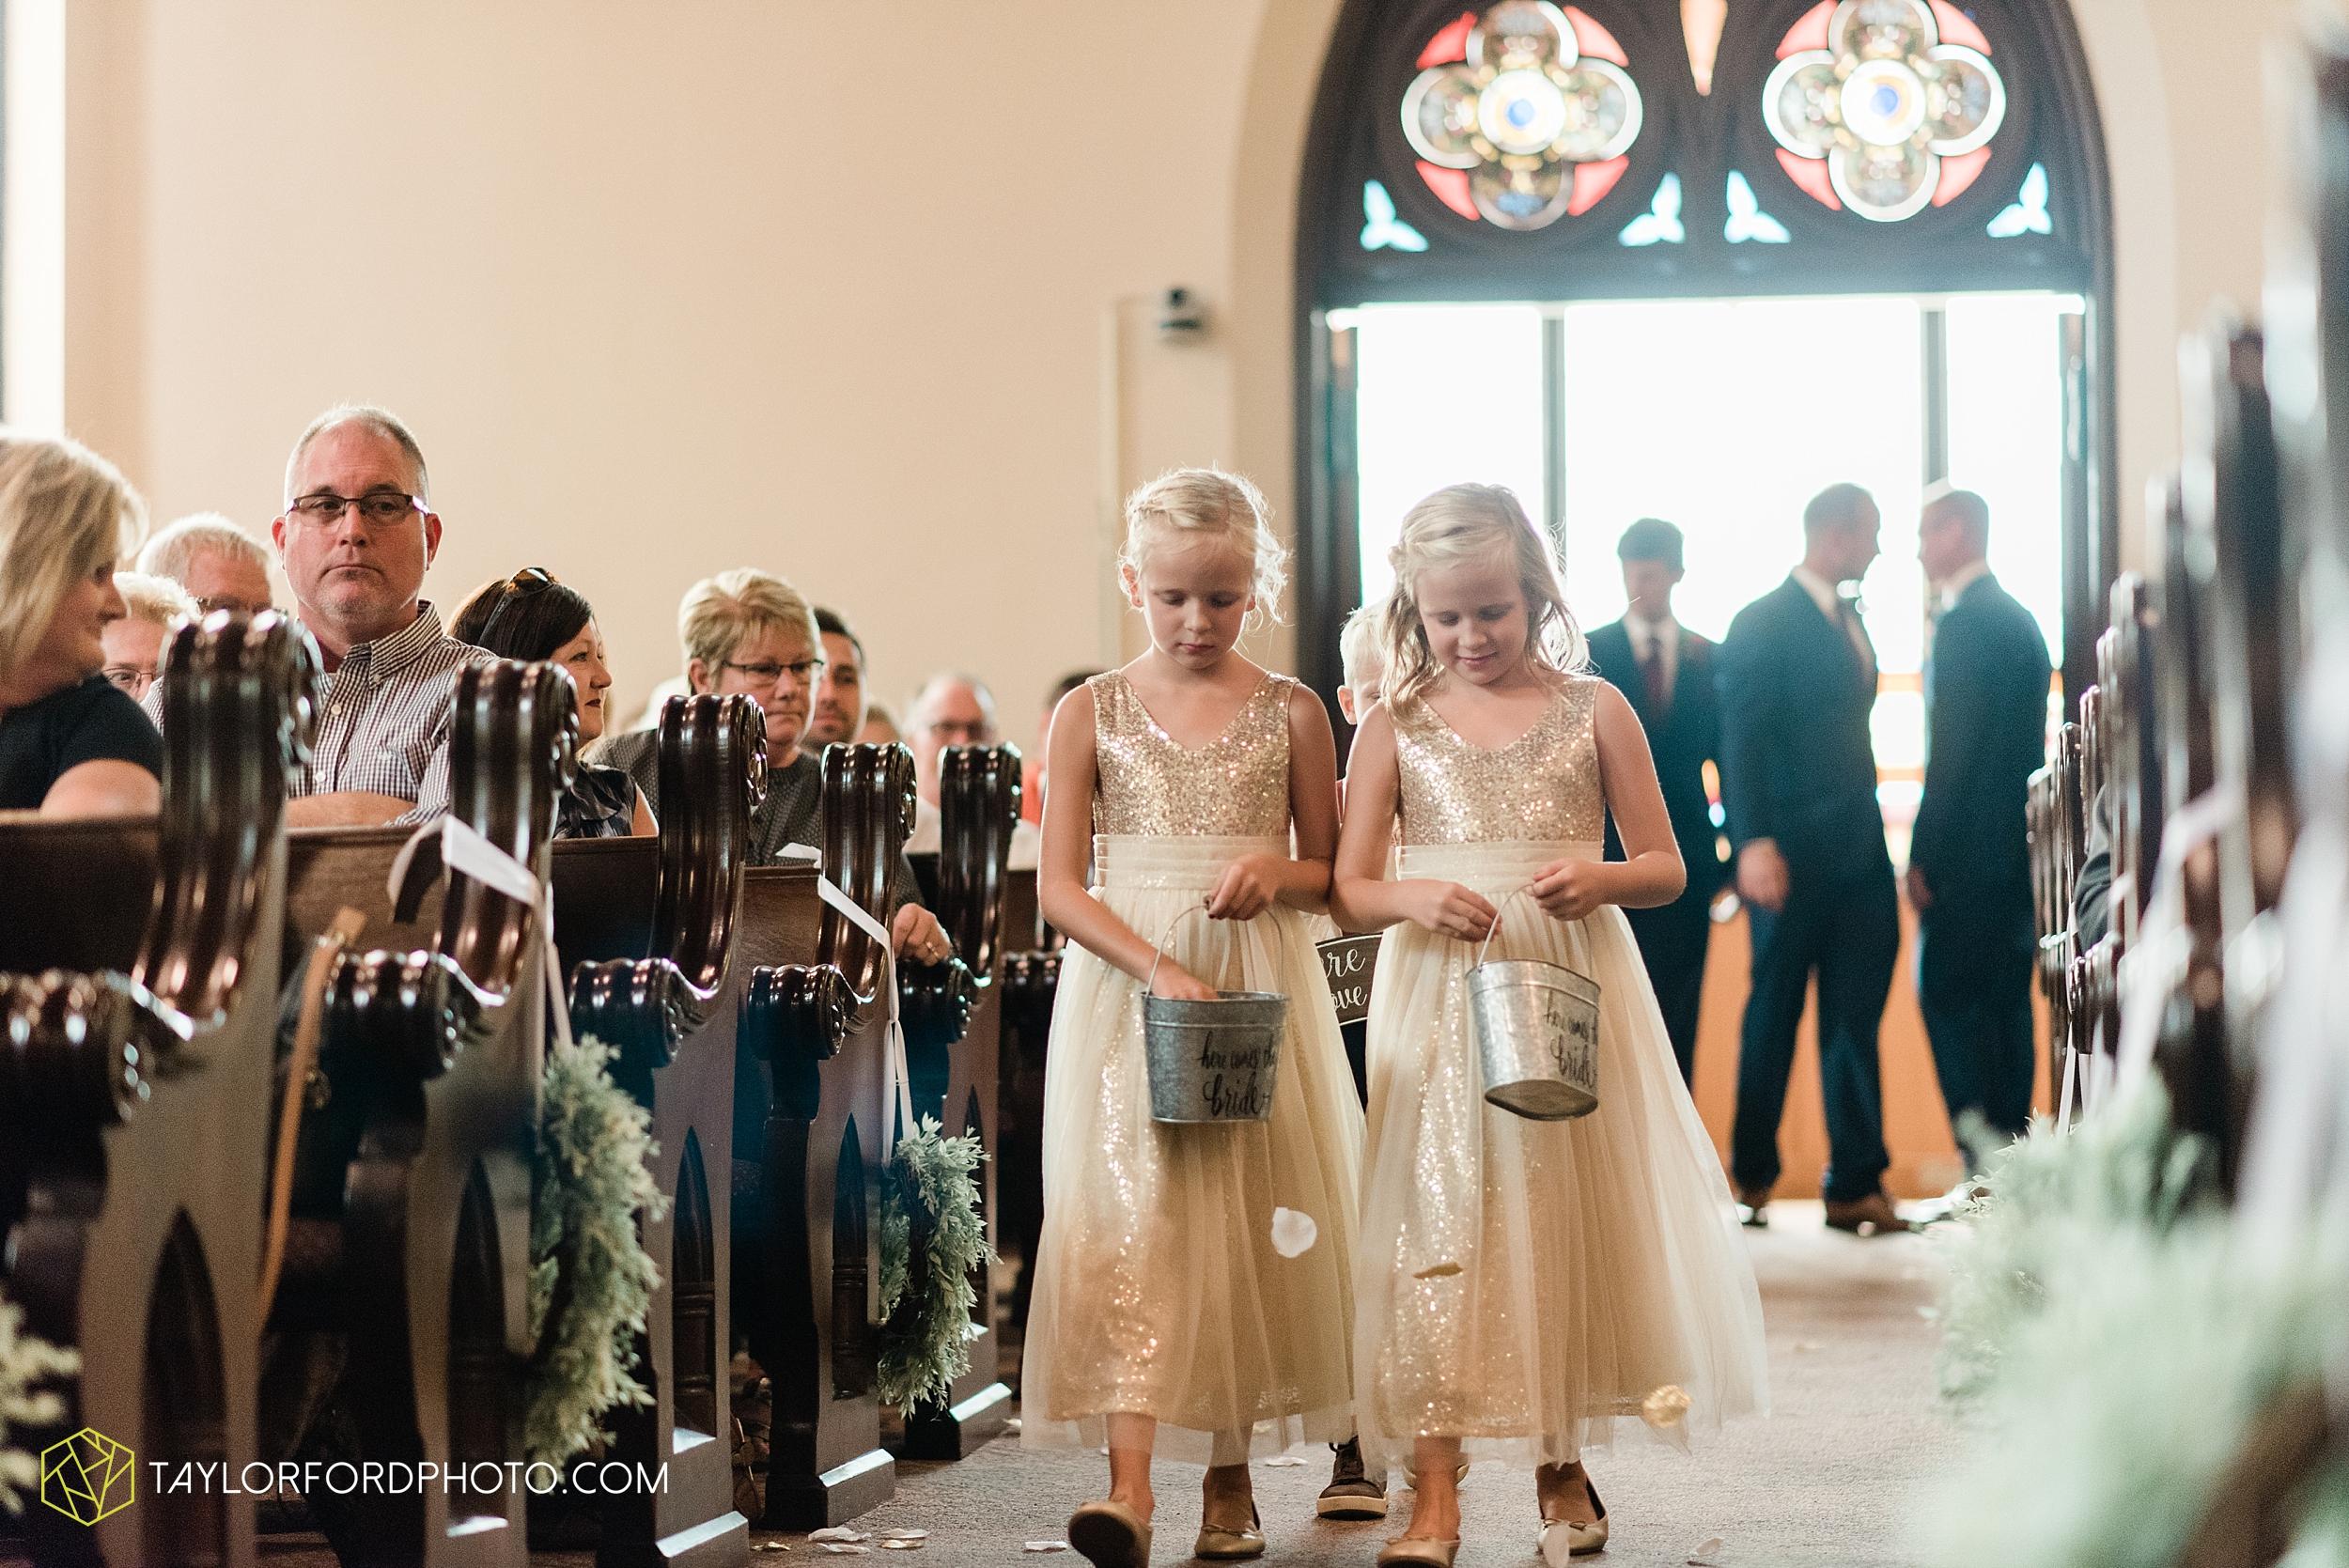 van-wert-ohio-first-united-methodist-church-county-dairy-barn-wedding-photographer-taylor-ford-photography_9825.jpg